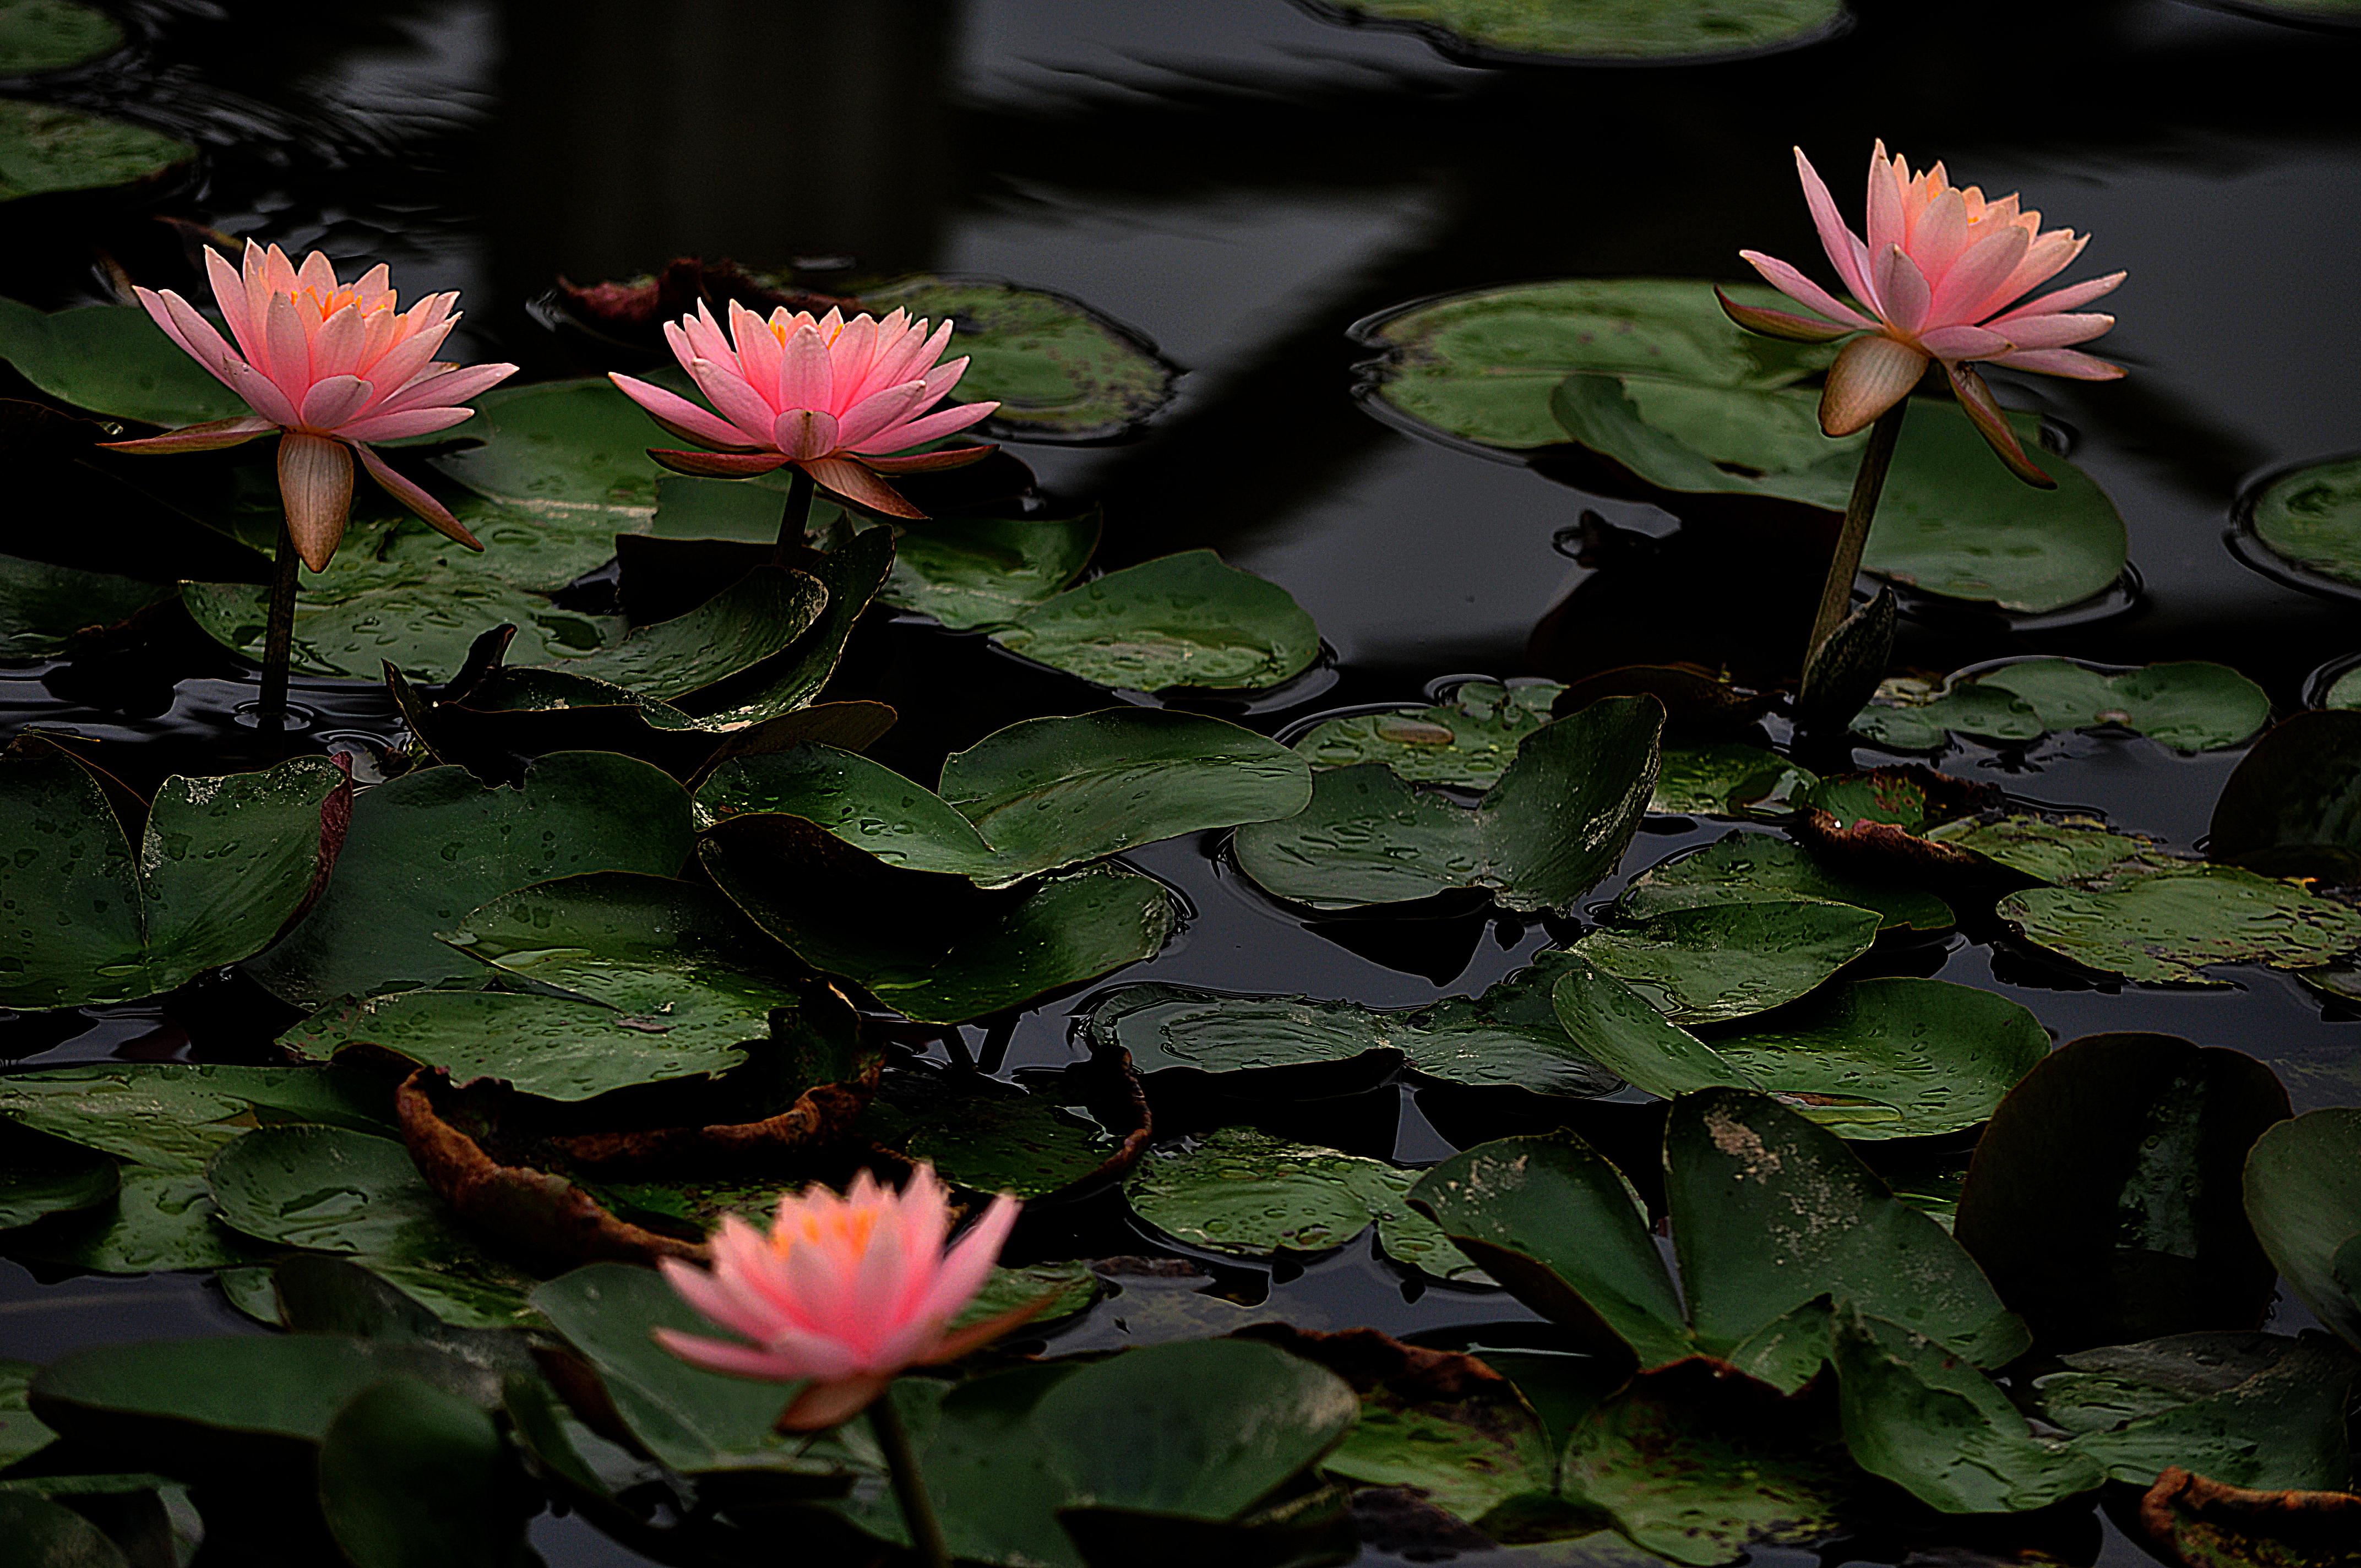 water lilies fonds d 39 cran arri res plan 4288x2848 id. Black Bedroom Furniture Sets. Home Design Ideas